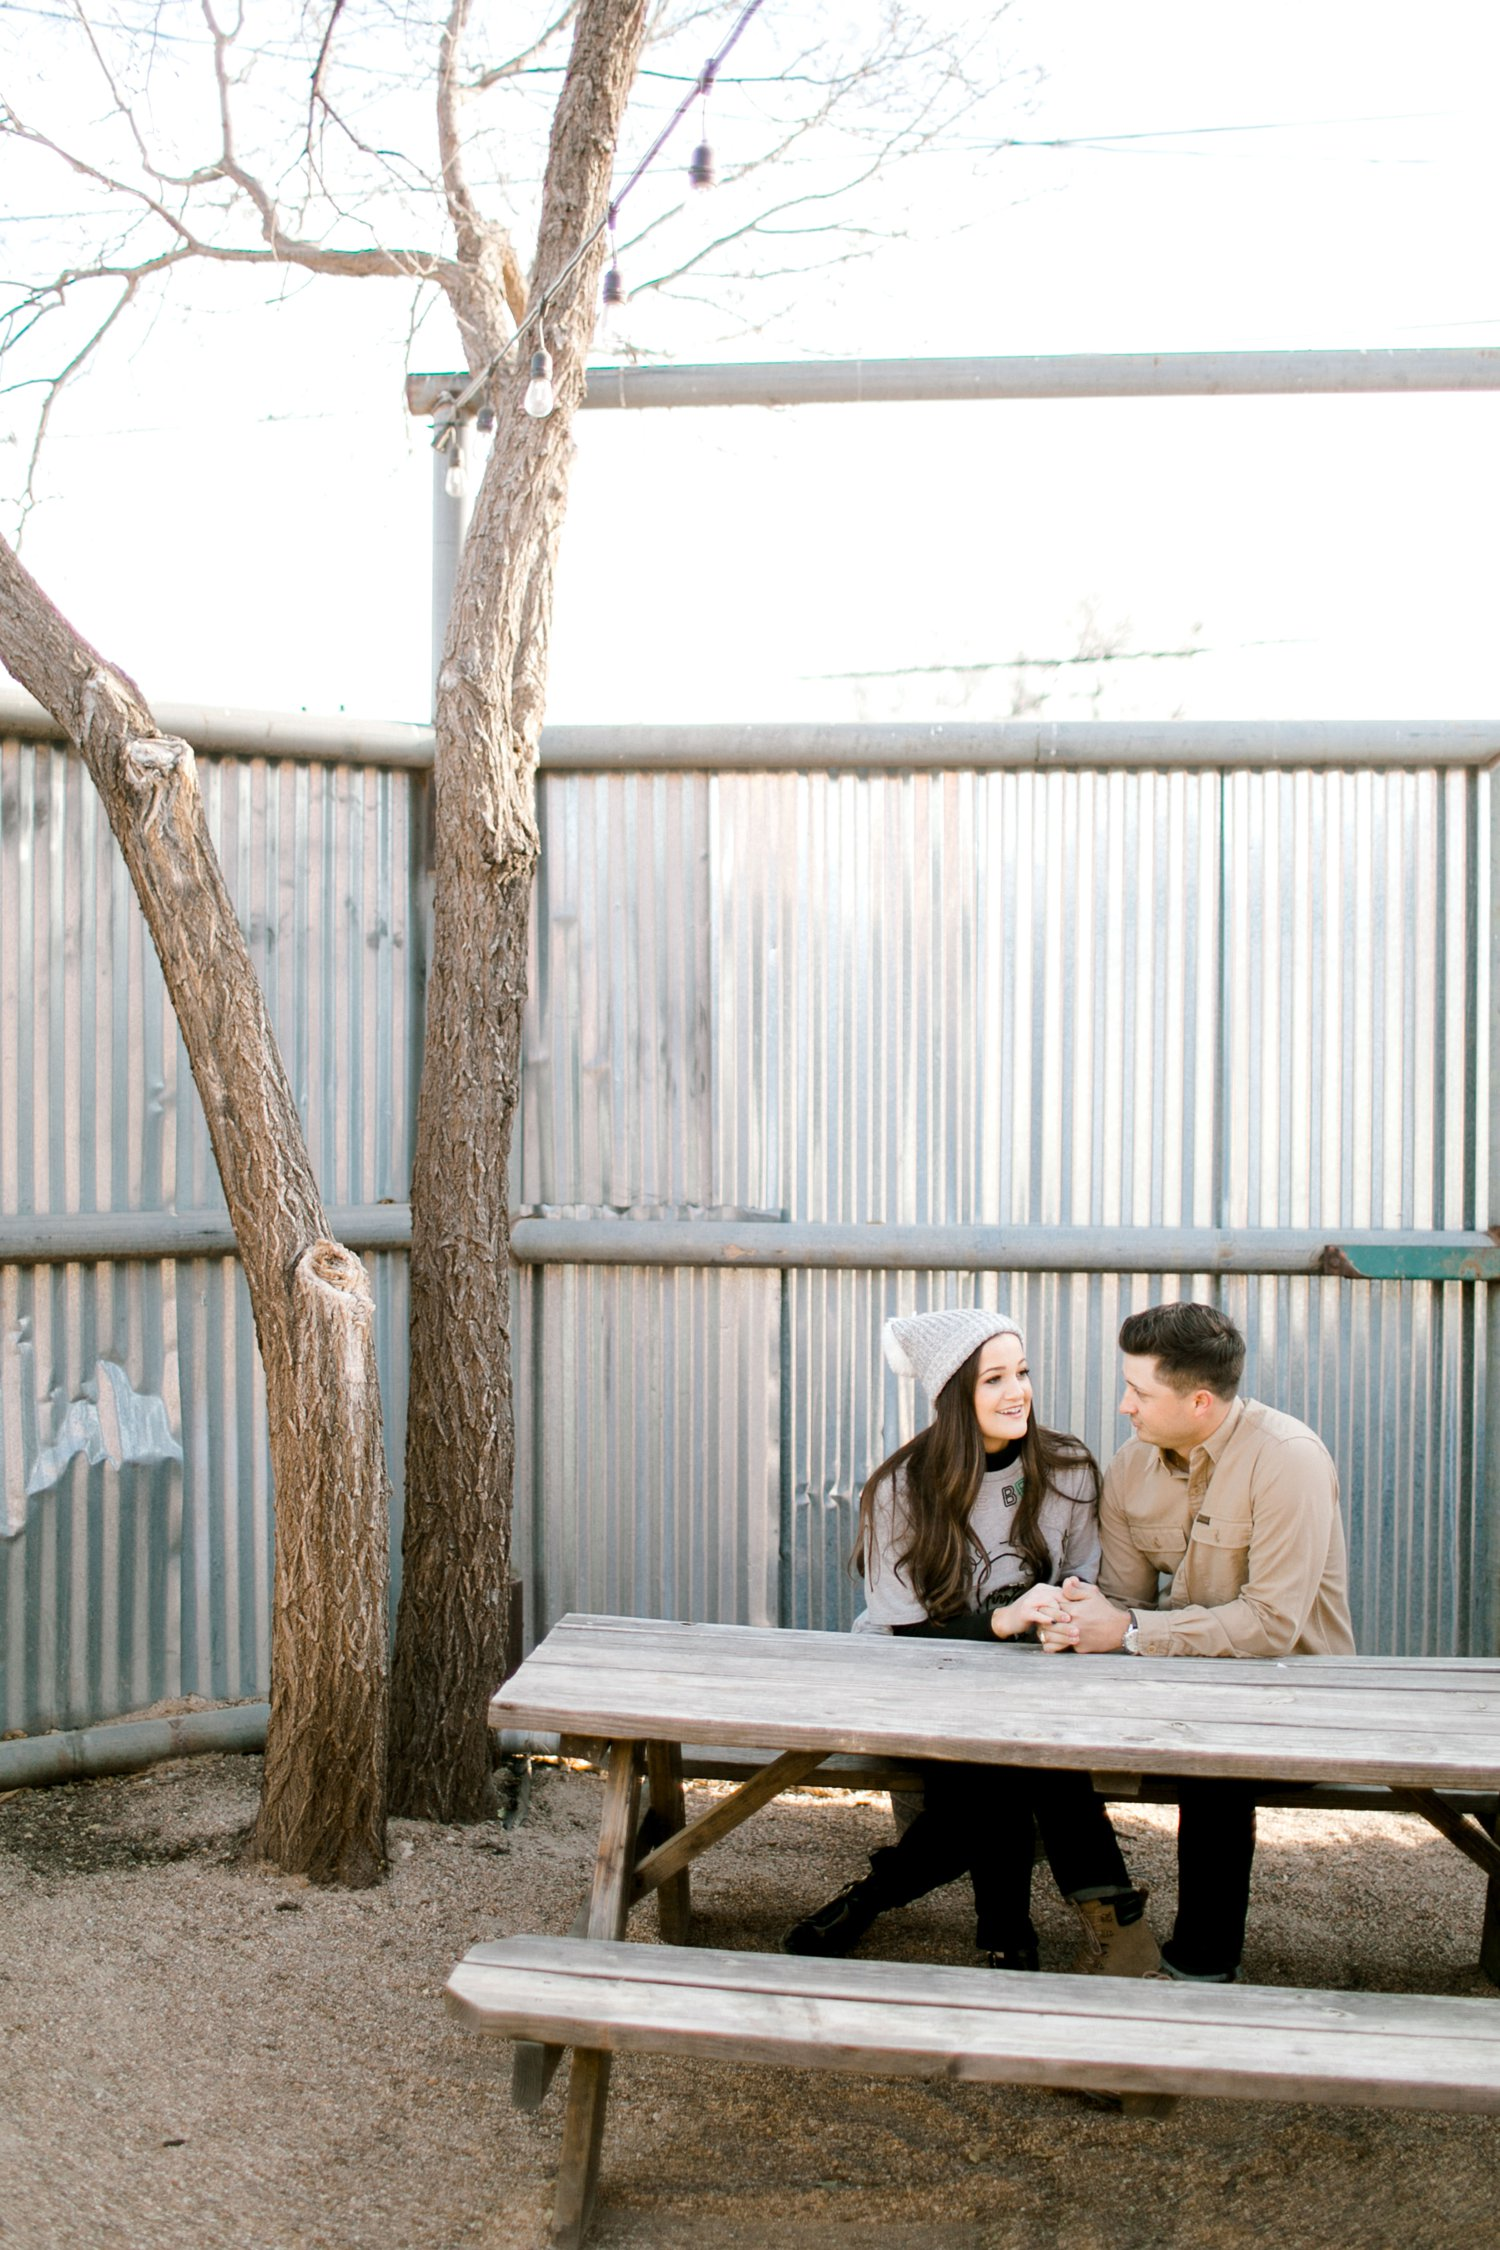 Steven-and-jenna-taubena-lubbock-texas-photographer_0003.jpg